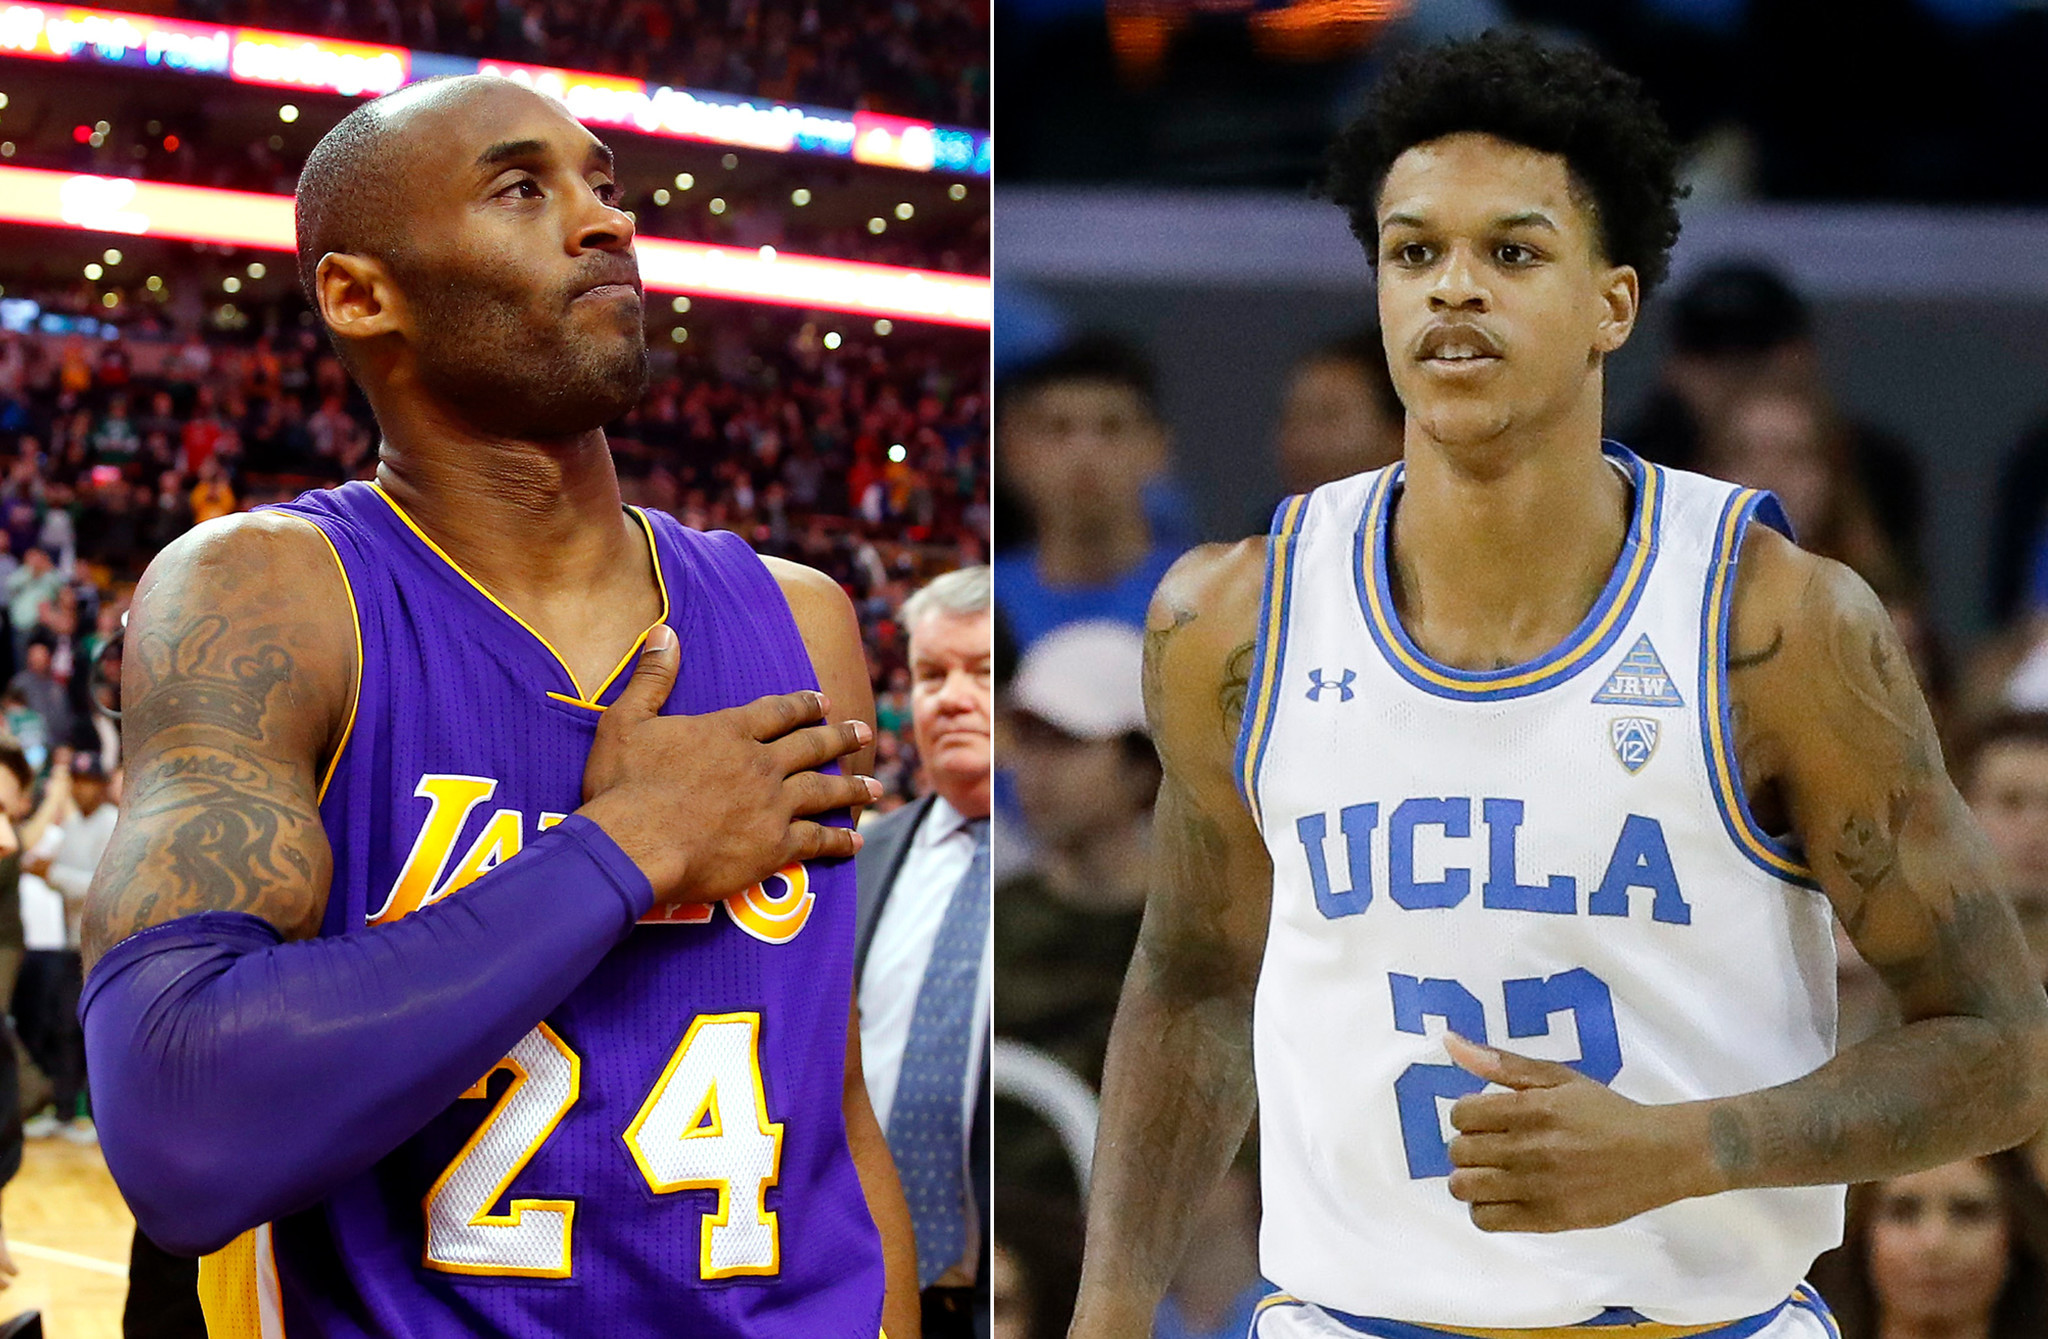 Shareef O'Neal, Shaq's baller son, posts heartbreaking final exchange with NBA legend Kobe Bryant